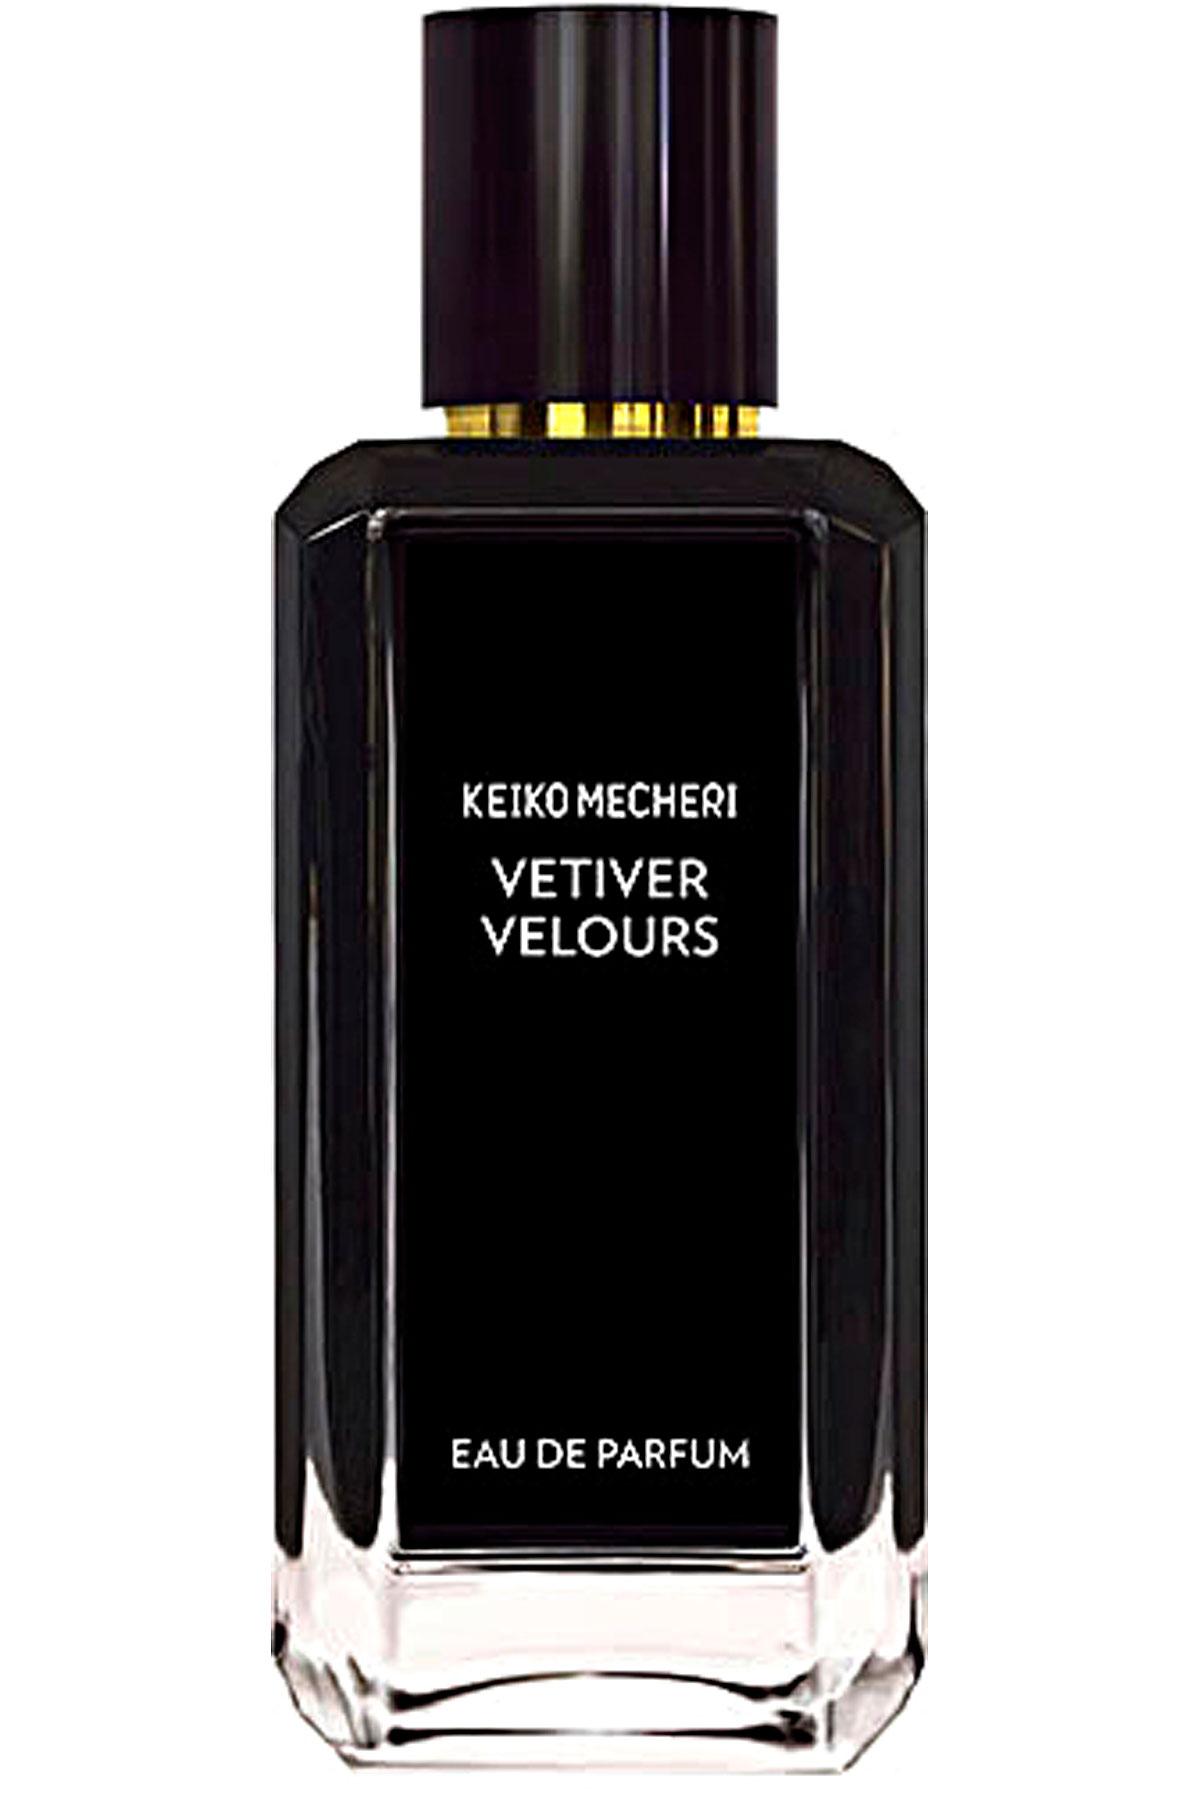 Keiko Mecheri Fragrances for Men, Vetiver Velours - Eau De Parfum - 100 Ml, 2019, 100 ml